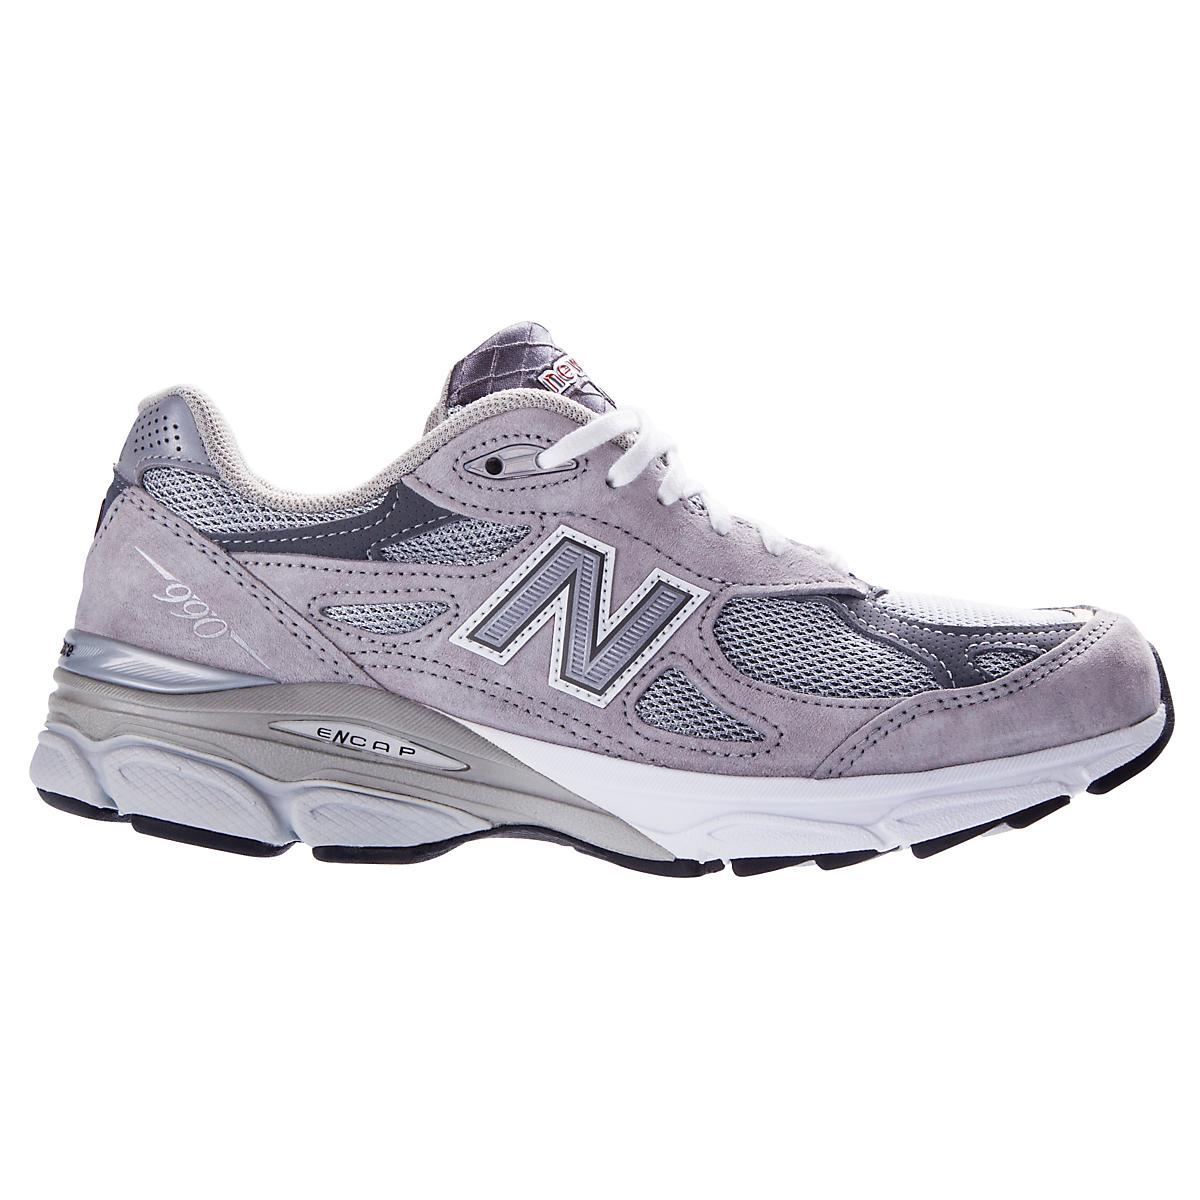 online retailer a6142 1eec3 Mens New Balance 990v3 Running Shoe at Road Runner Sports